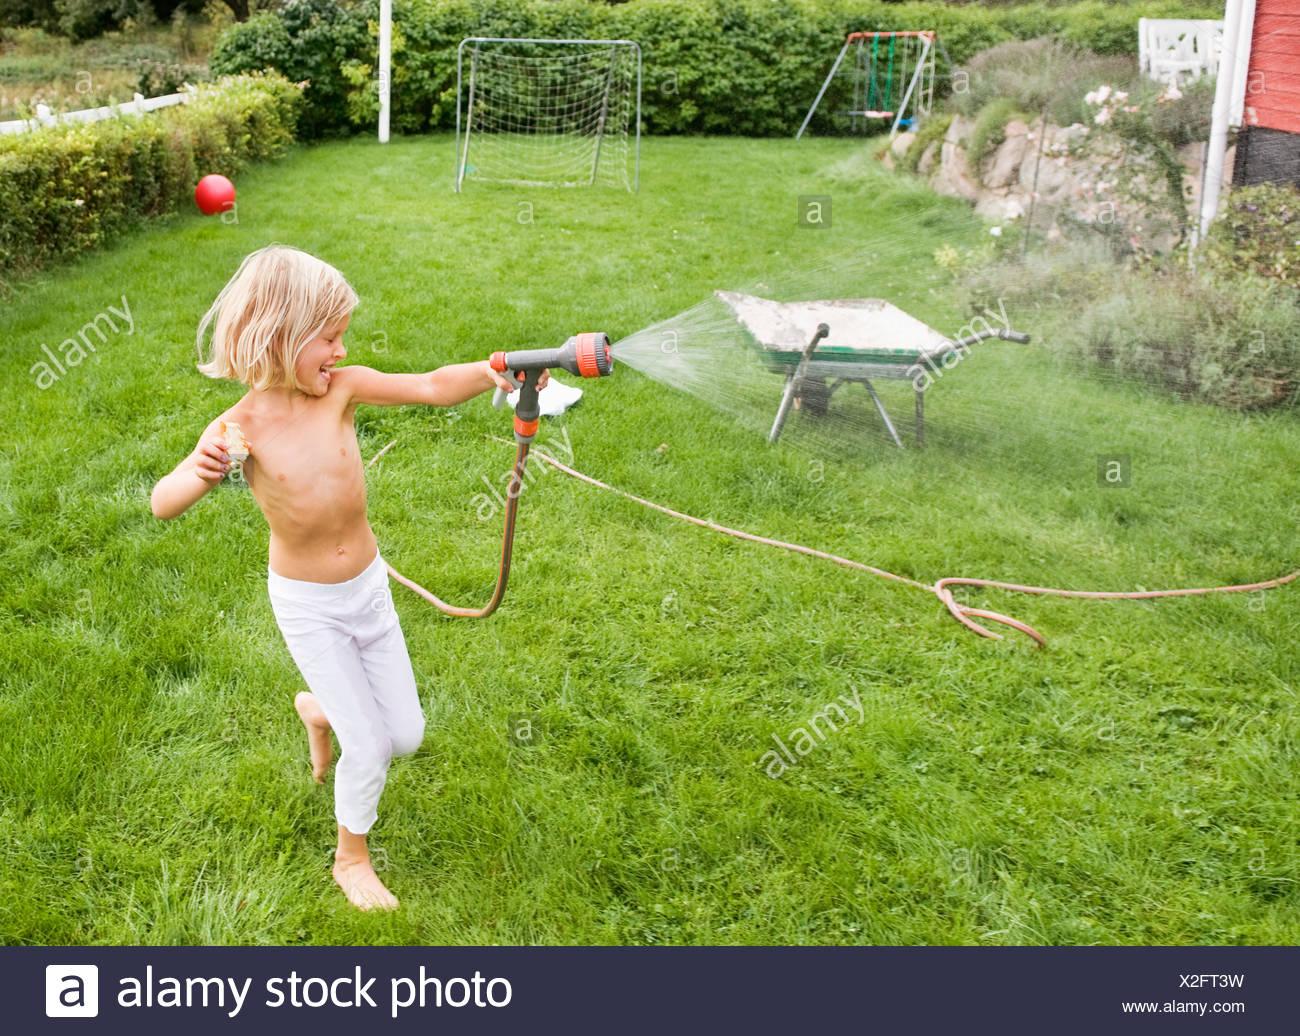 Girl holding water hose - Stock Image